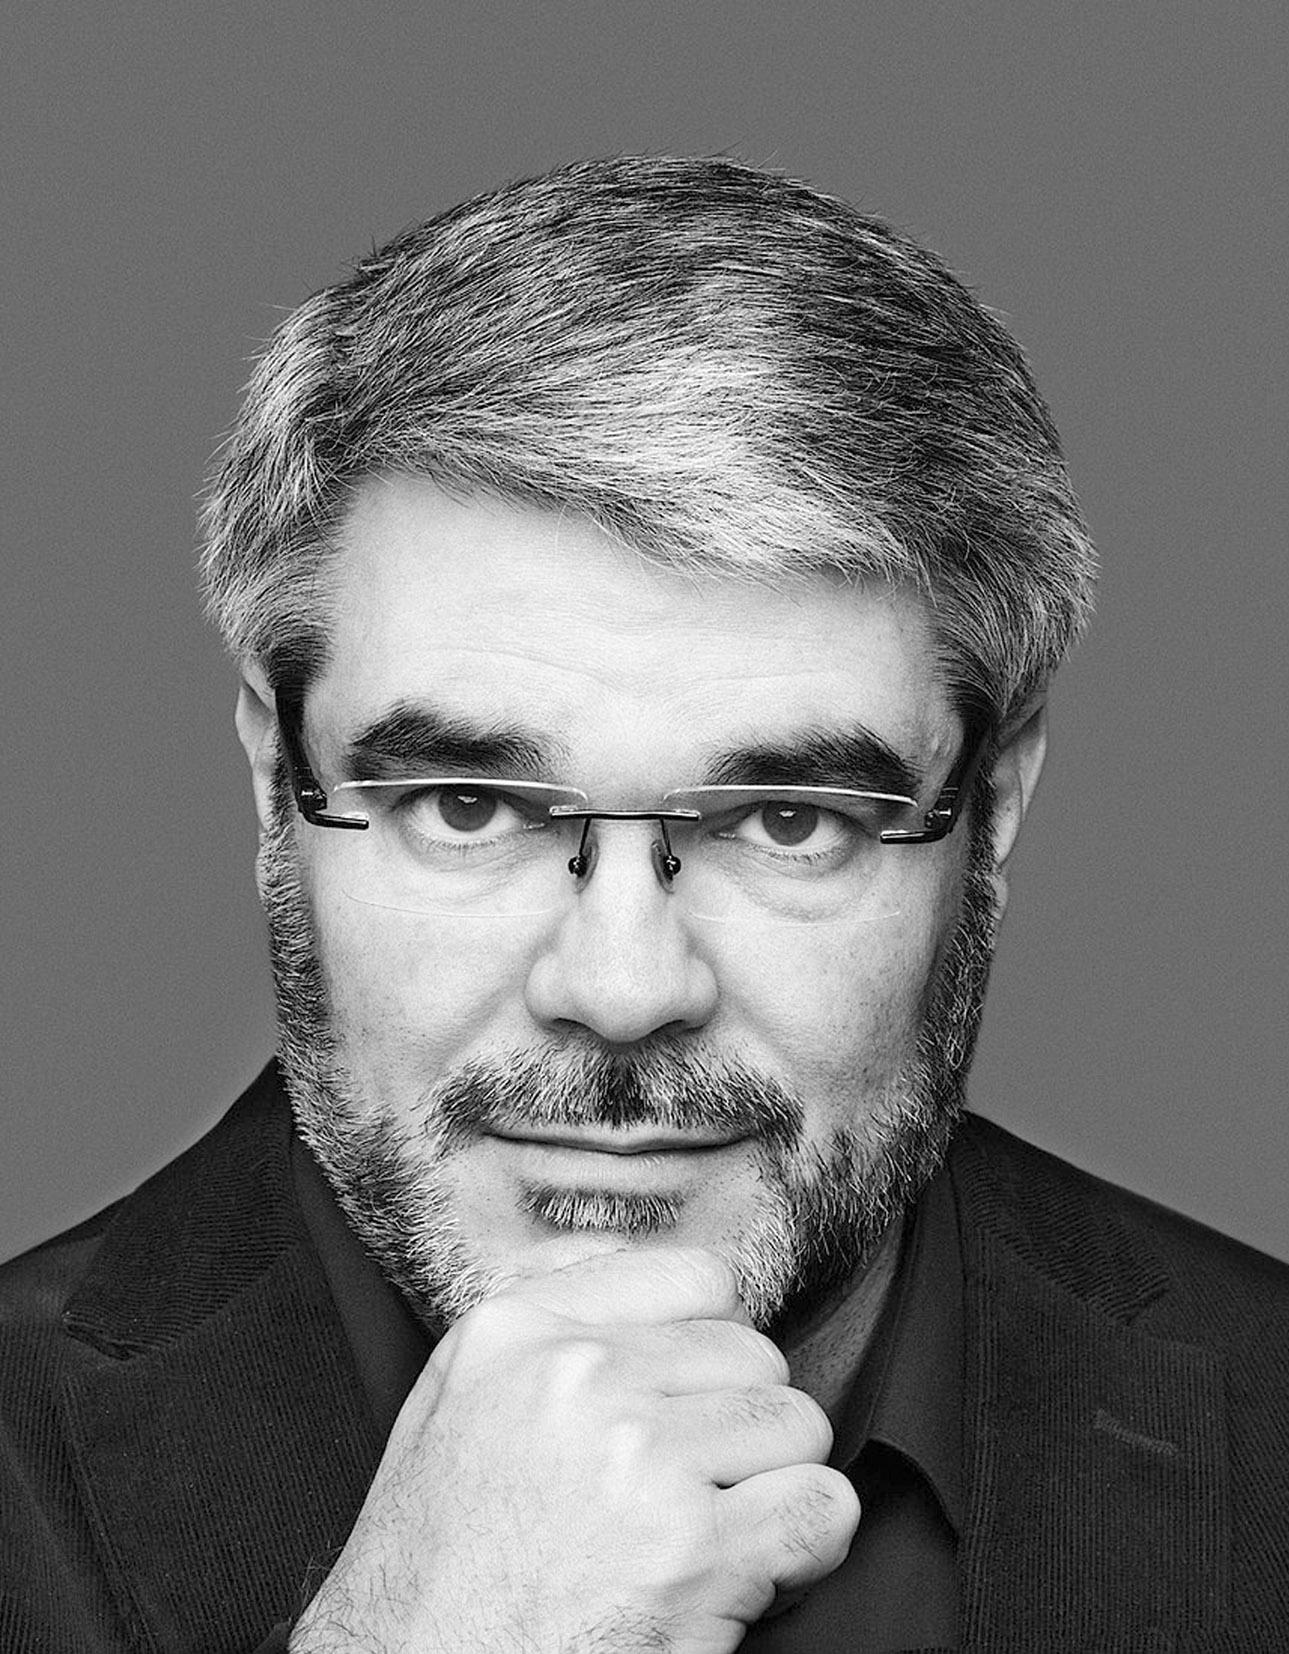 Jorge Fonte